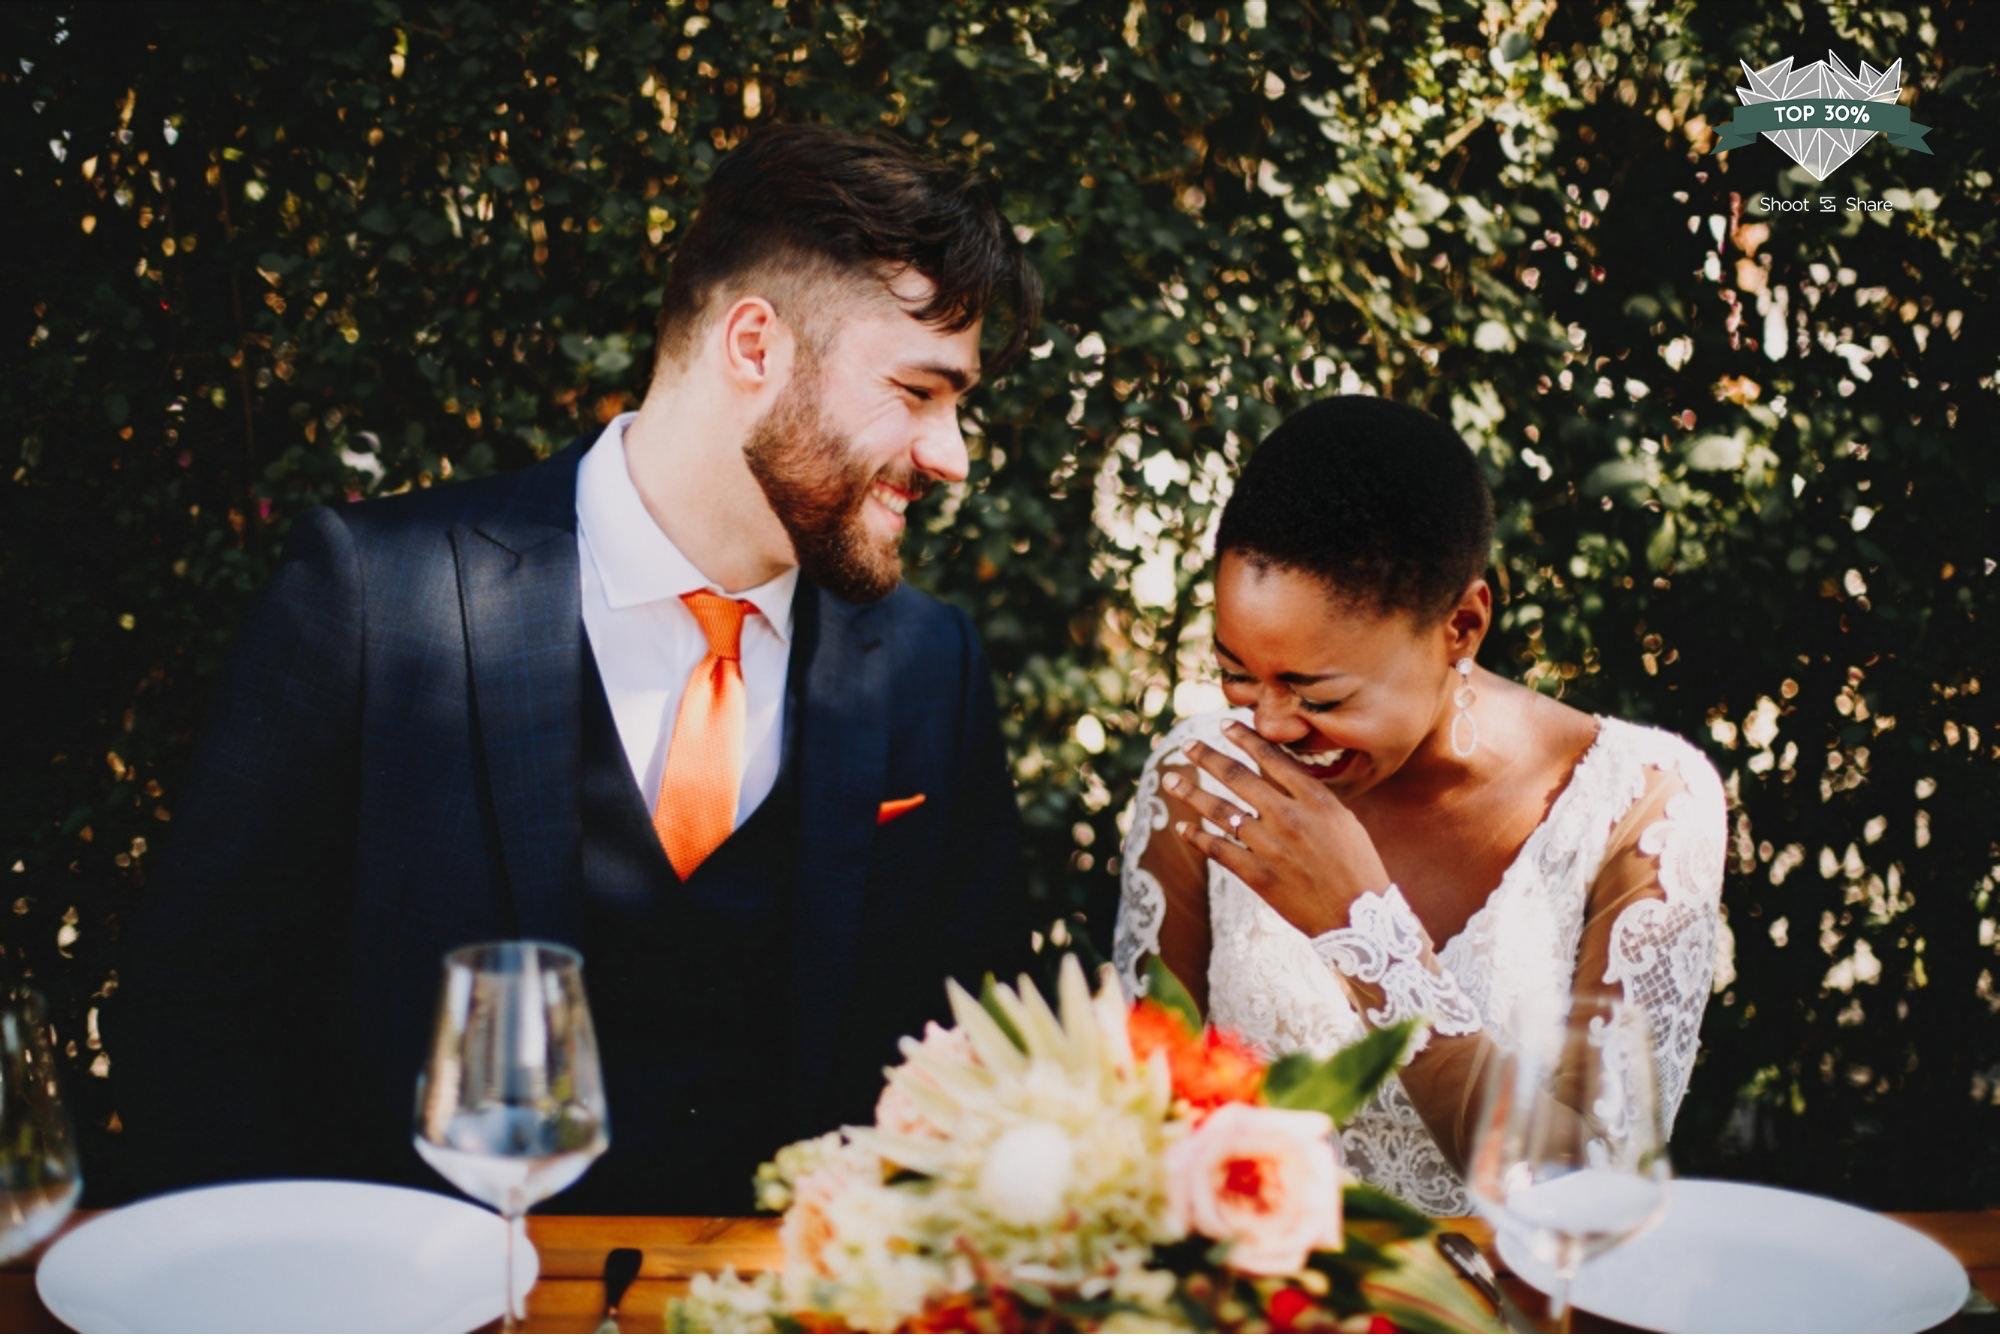 Archer Inspired Photography Shoot and Share Family Wedding Lifestyle Photographer Morgan Hill California San Francisco Bay Area-18.jpg